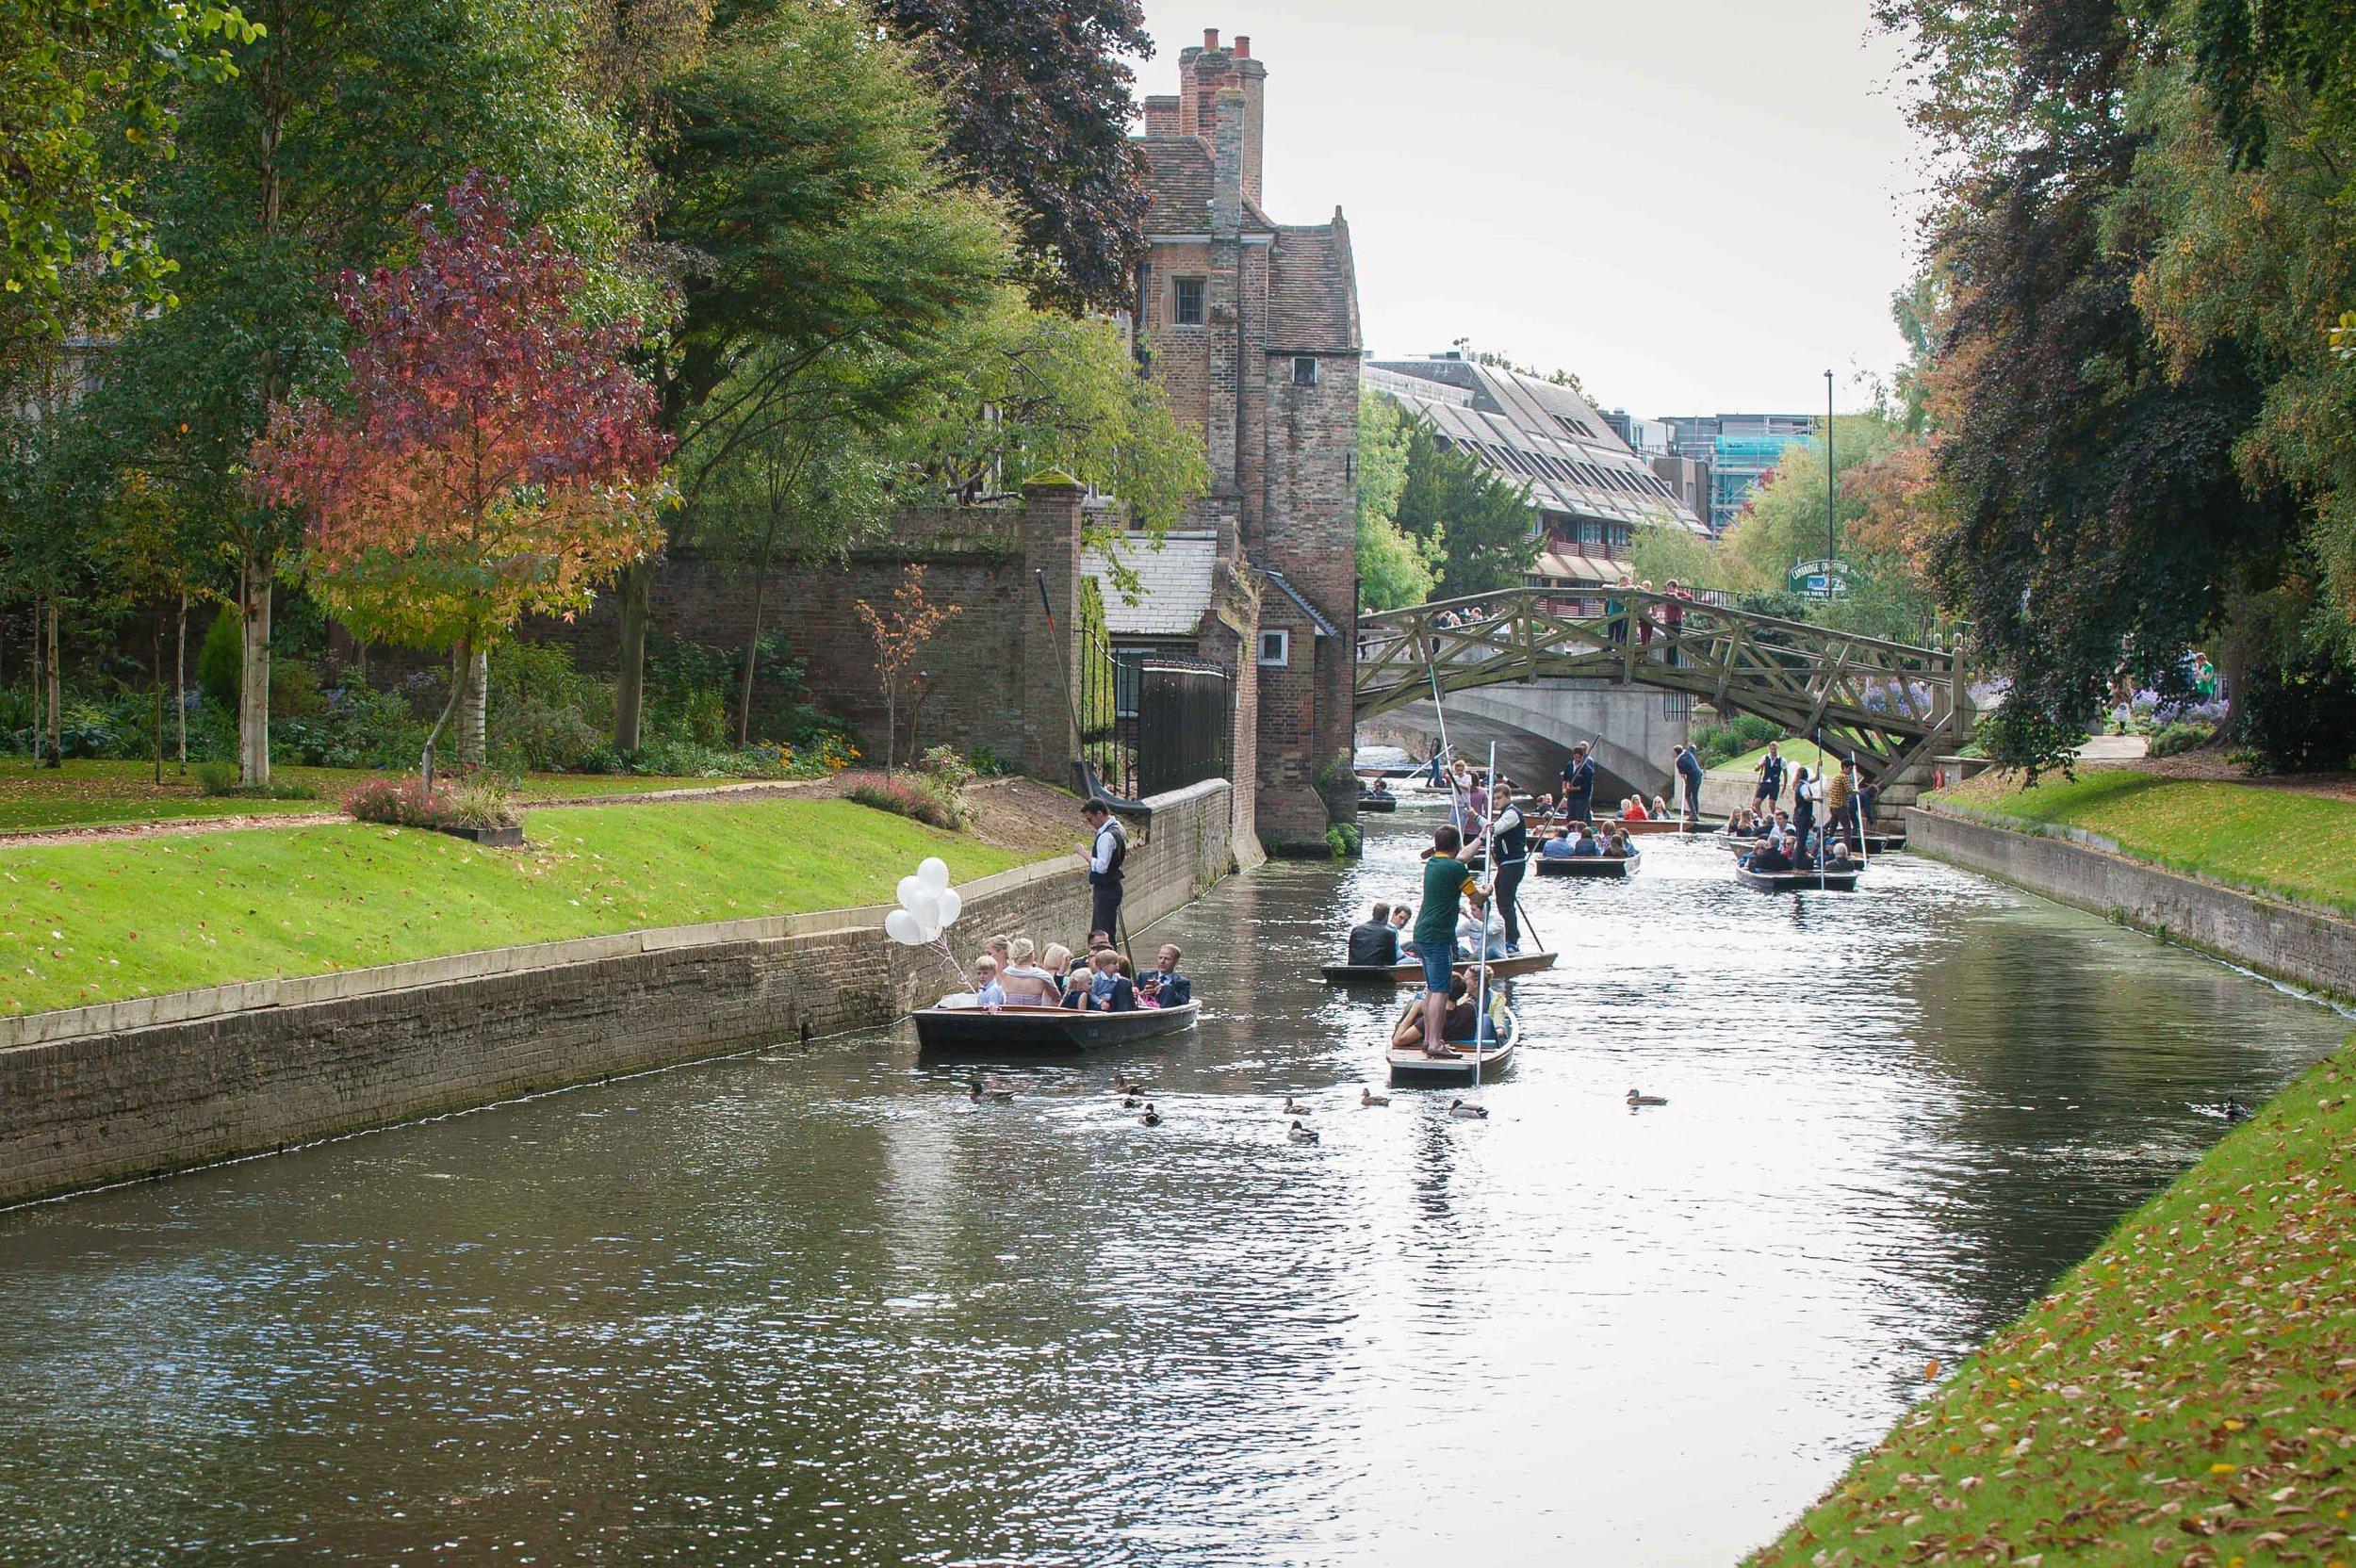 Adrian_Nicole_Charnwood_Weddings_Queens_College_Cambridge-1046.jpg